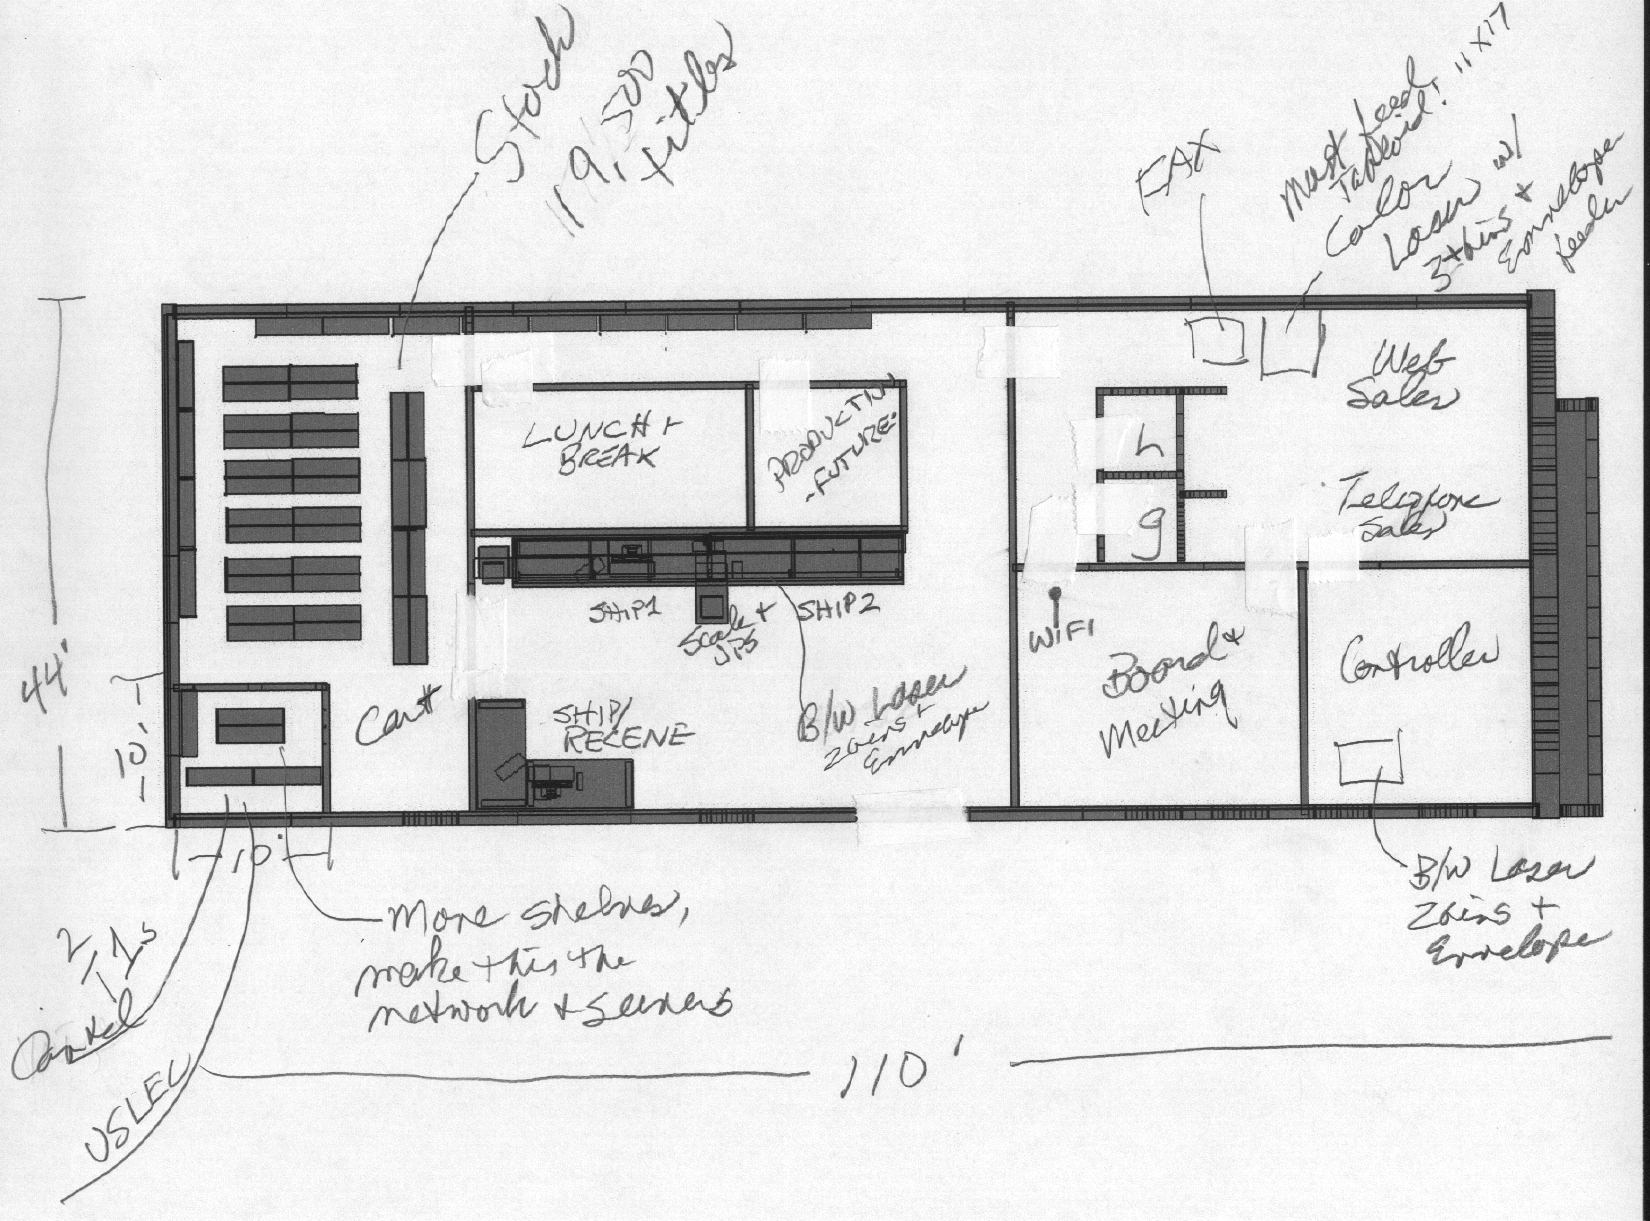 Lan Diagram And Bill Of Details